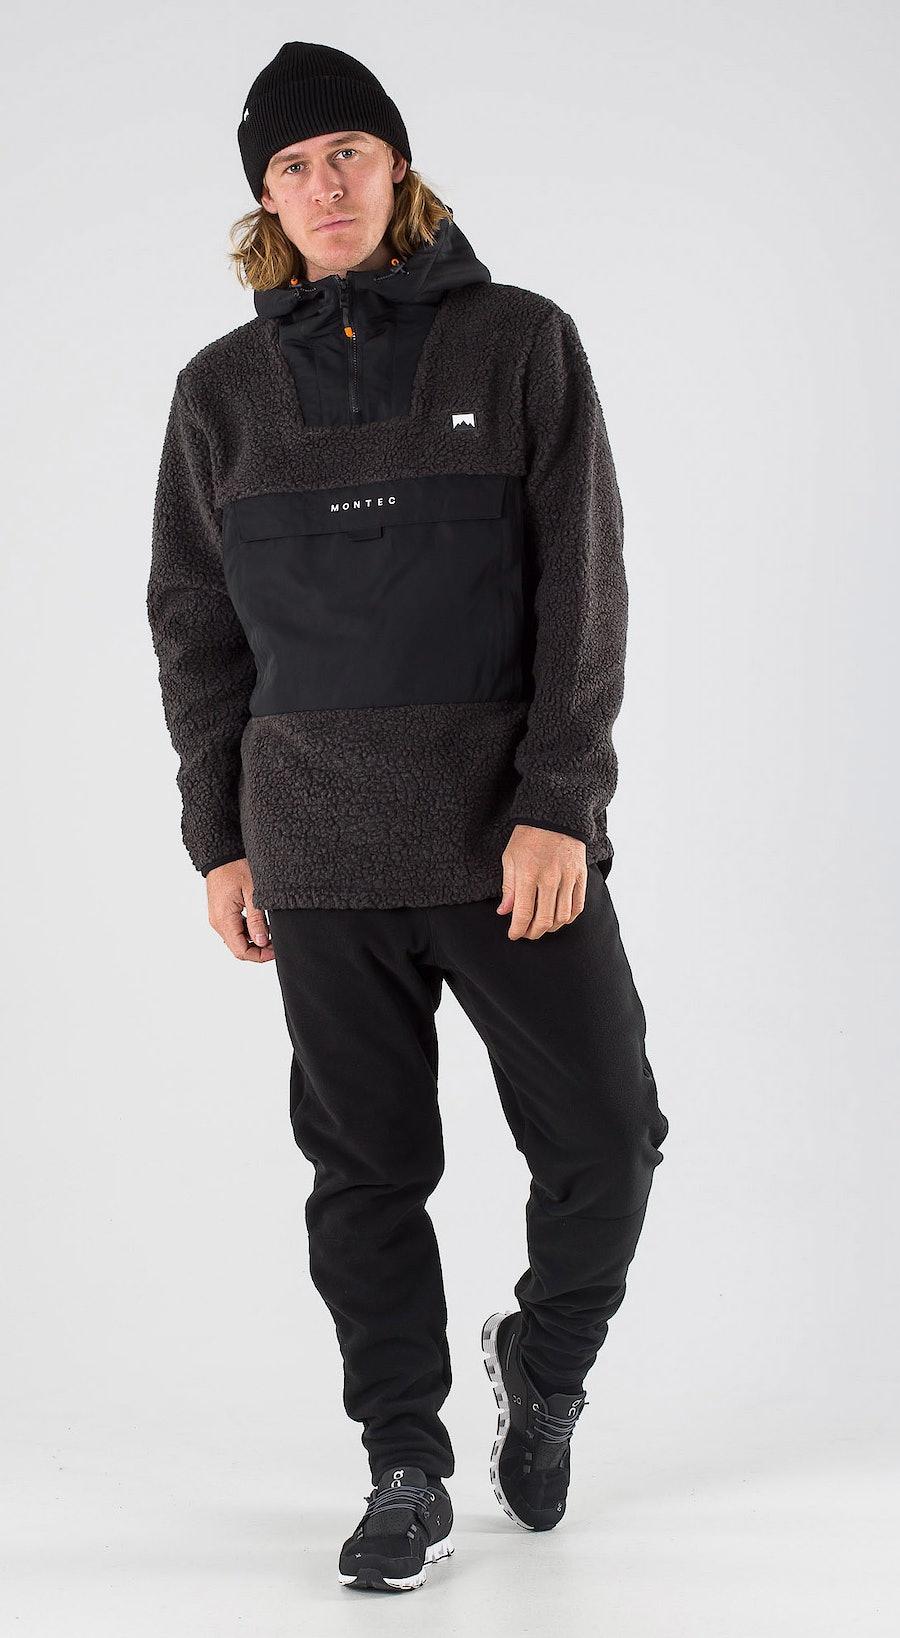 Montec Lima Black/Phantom Outfit Multi